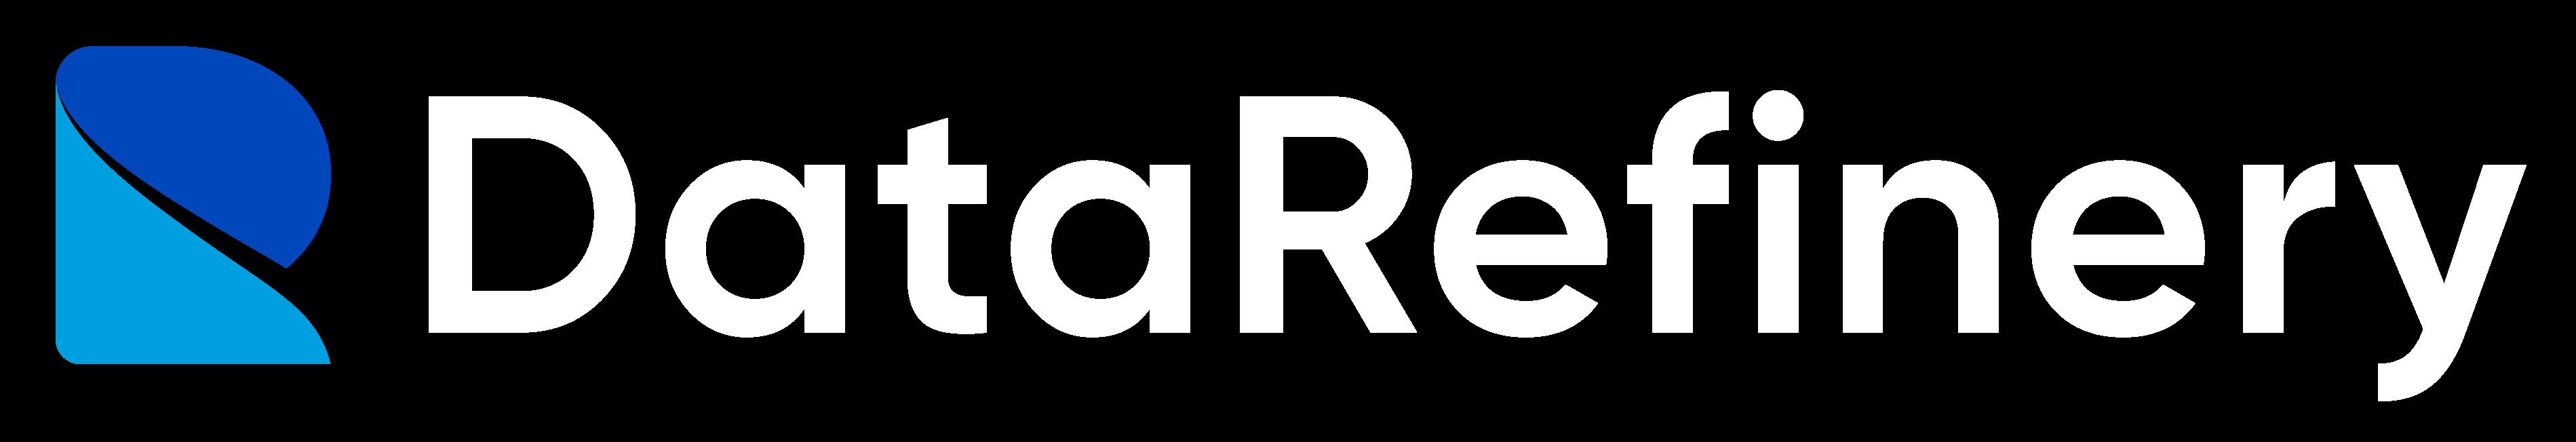 Data Refinery logo white